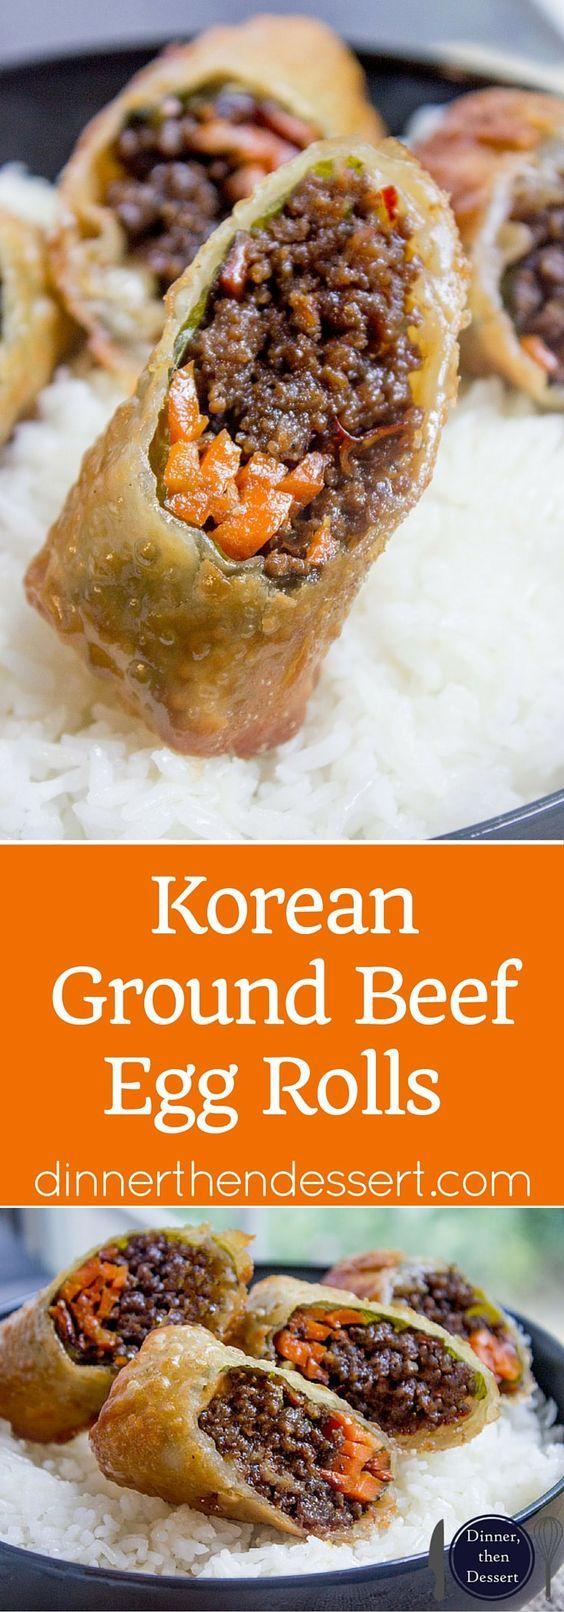 Best 25+ Pork belly ideas on Pinterest | Asian pork belly ...